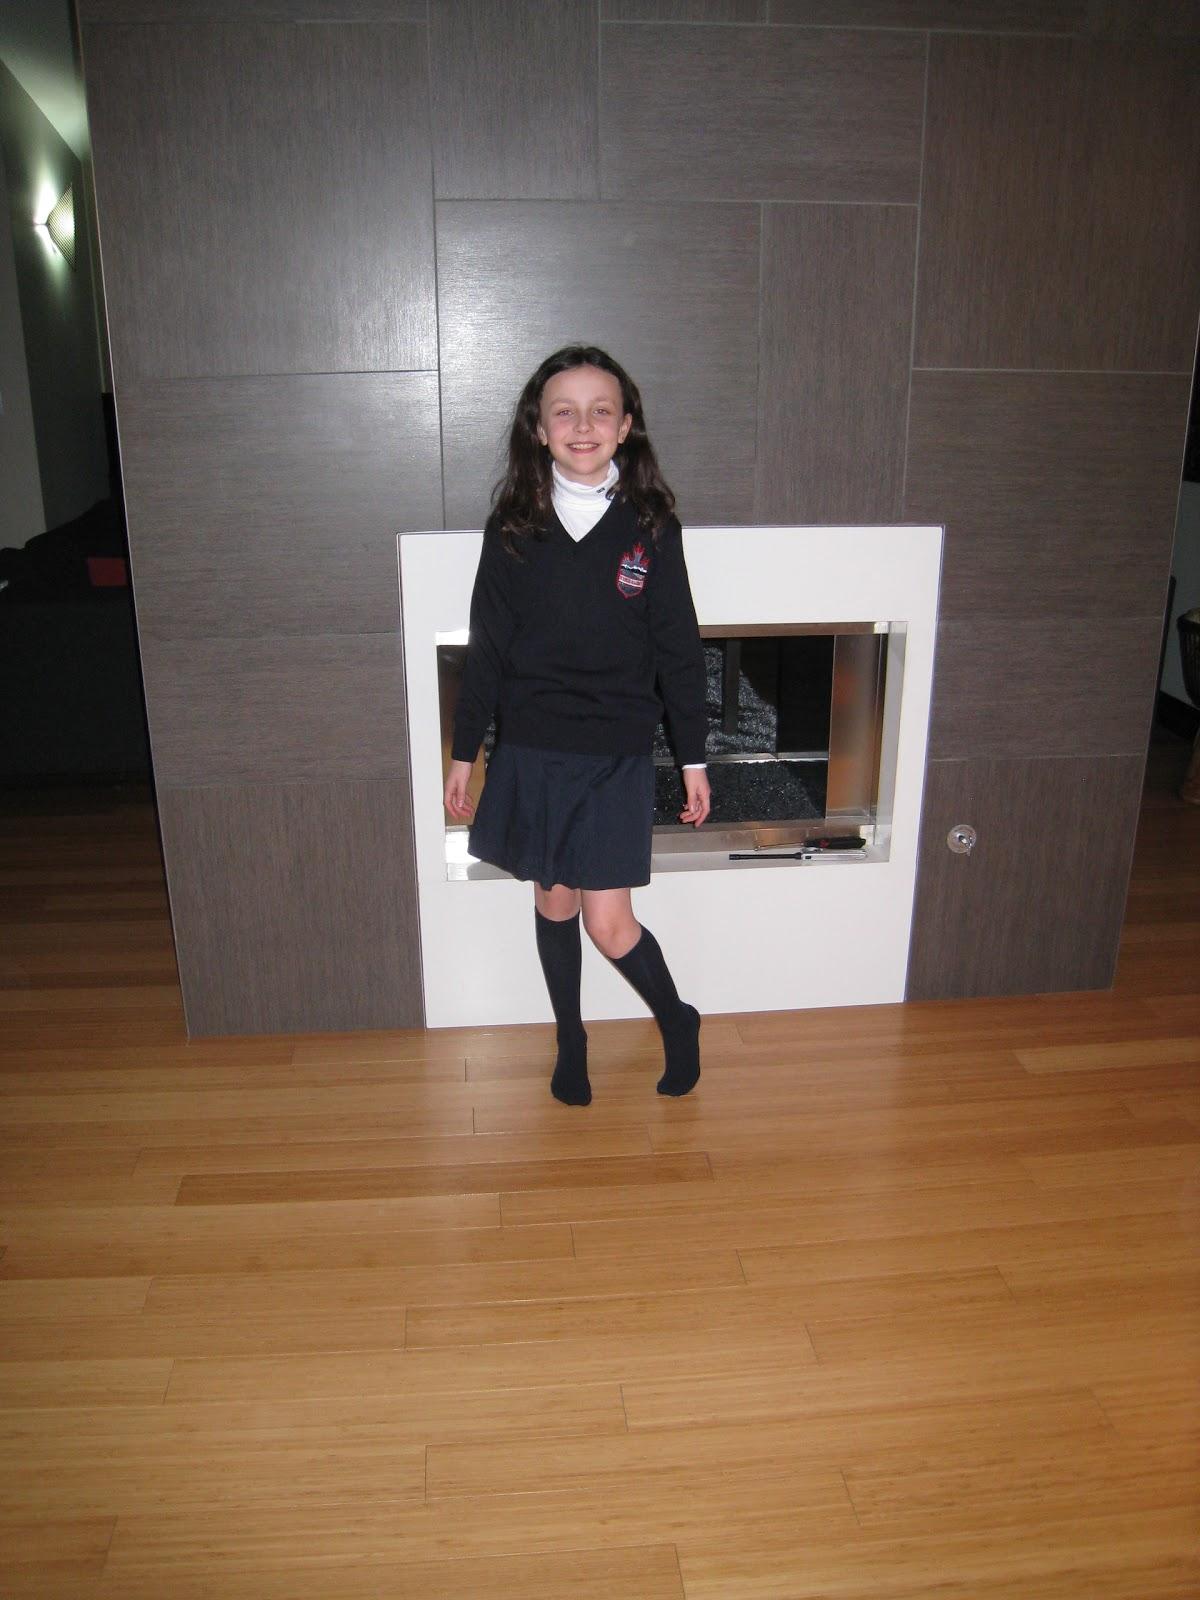 gallowaysincalgary: New School - Day Two